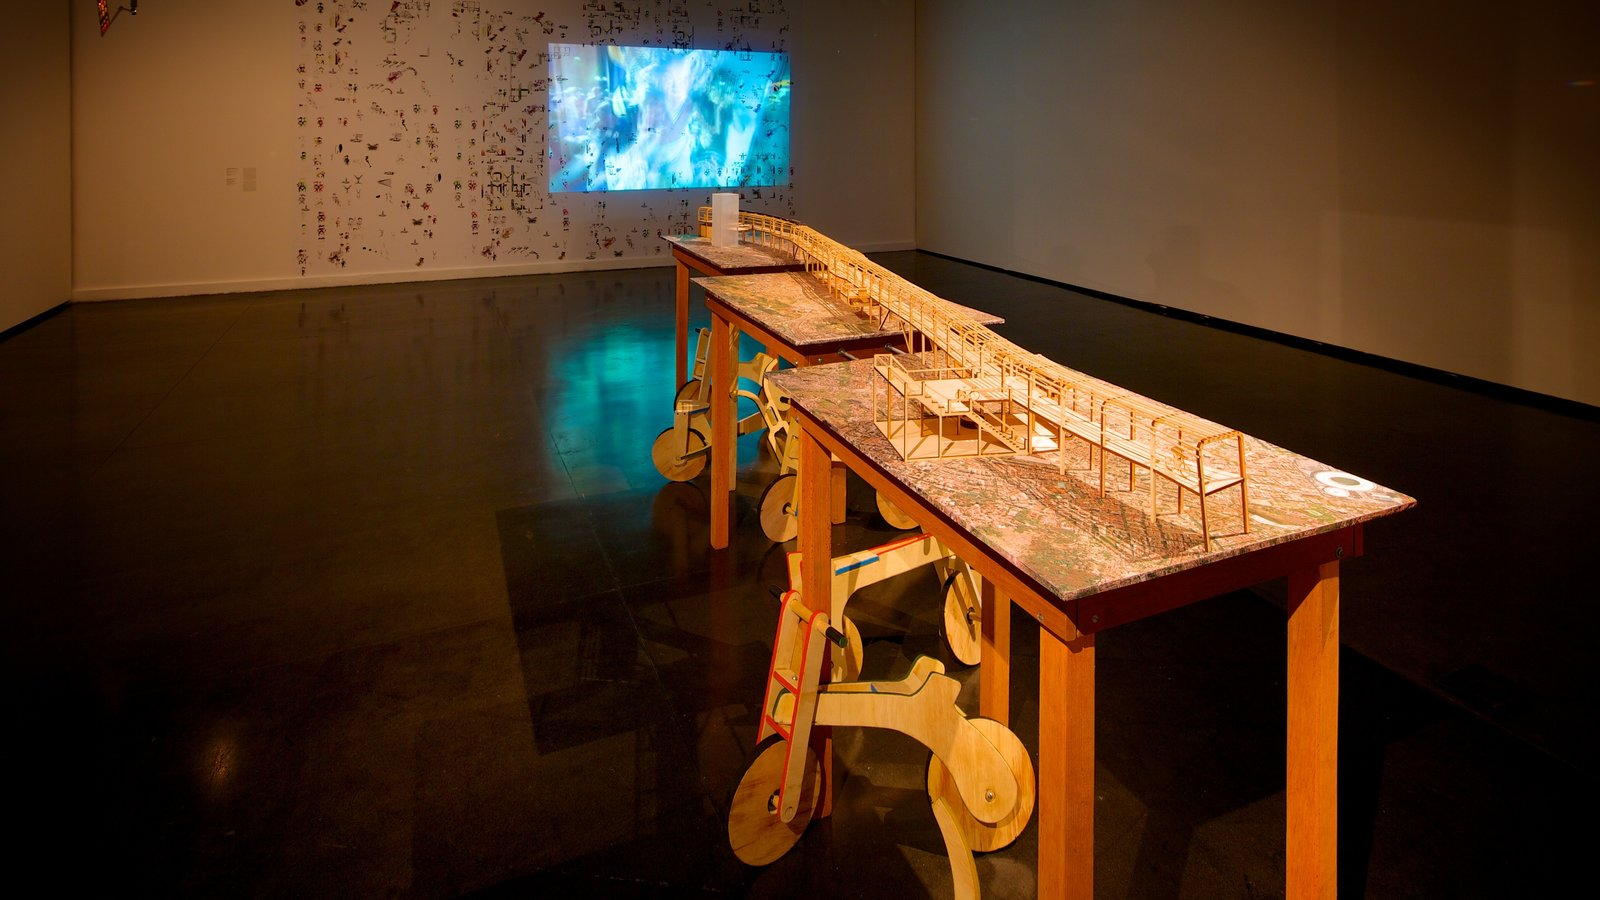 Museu de Arte Moderna caracterizando vistas internas e arte